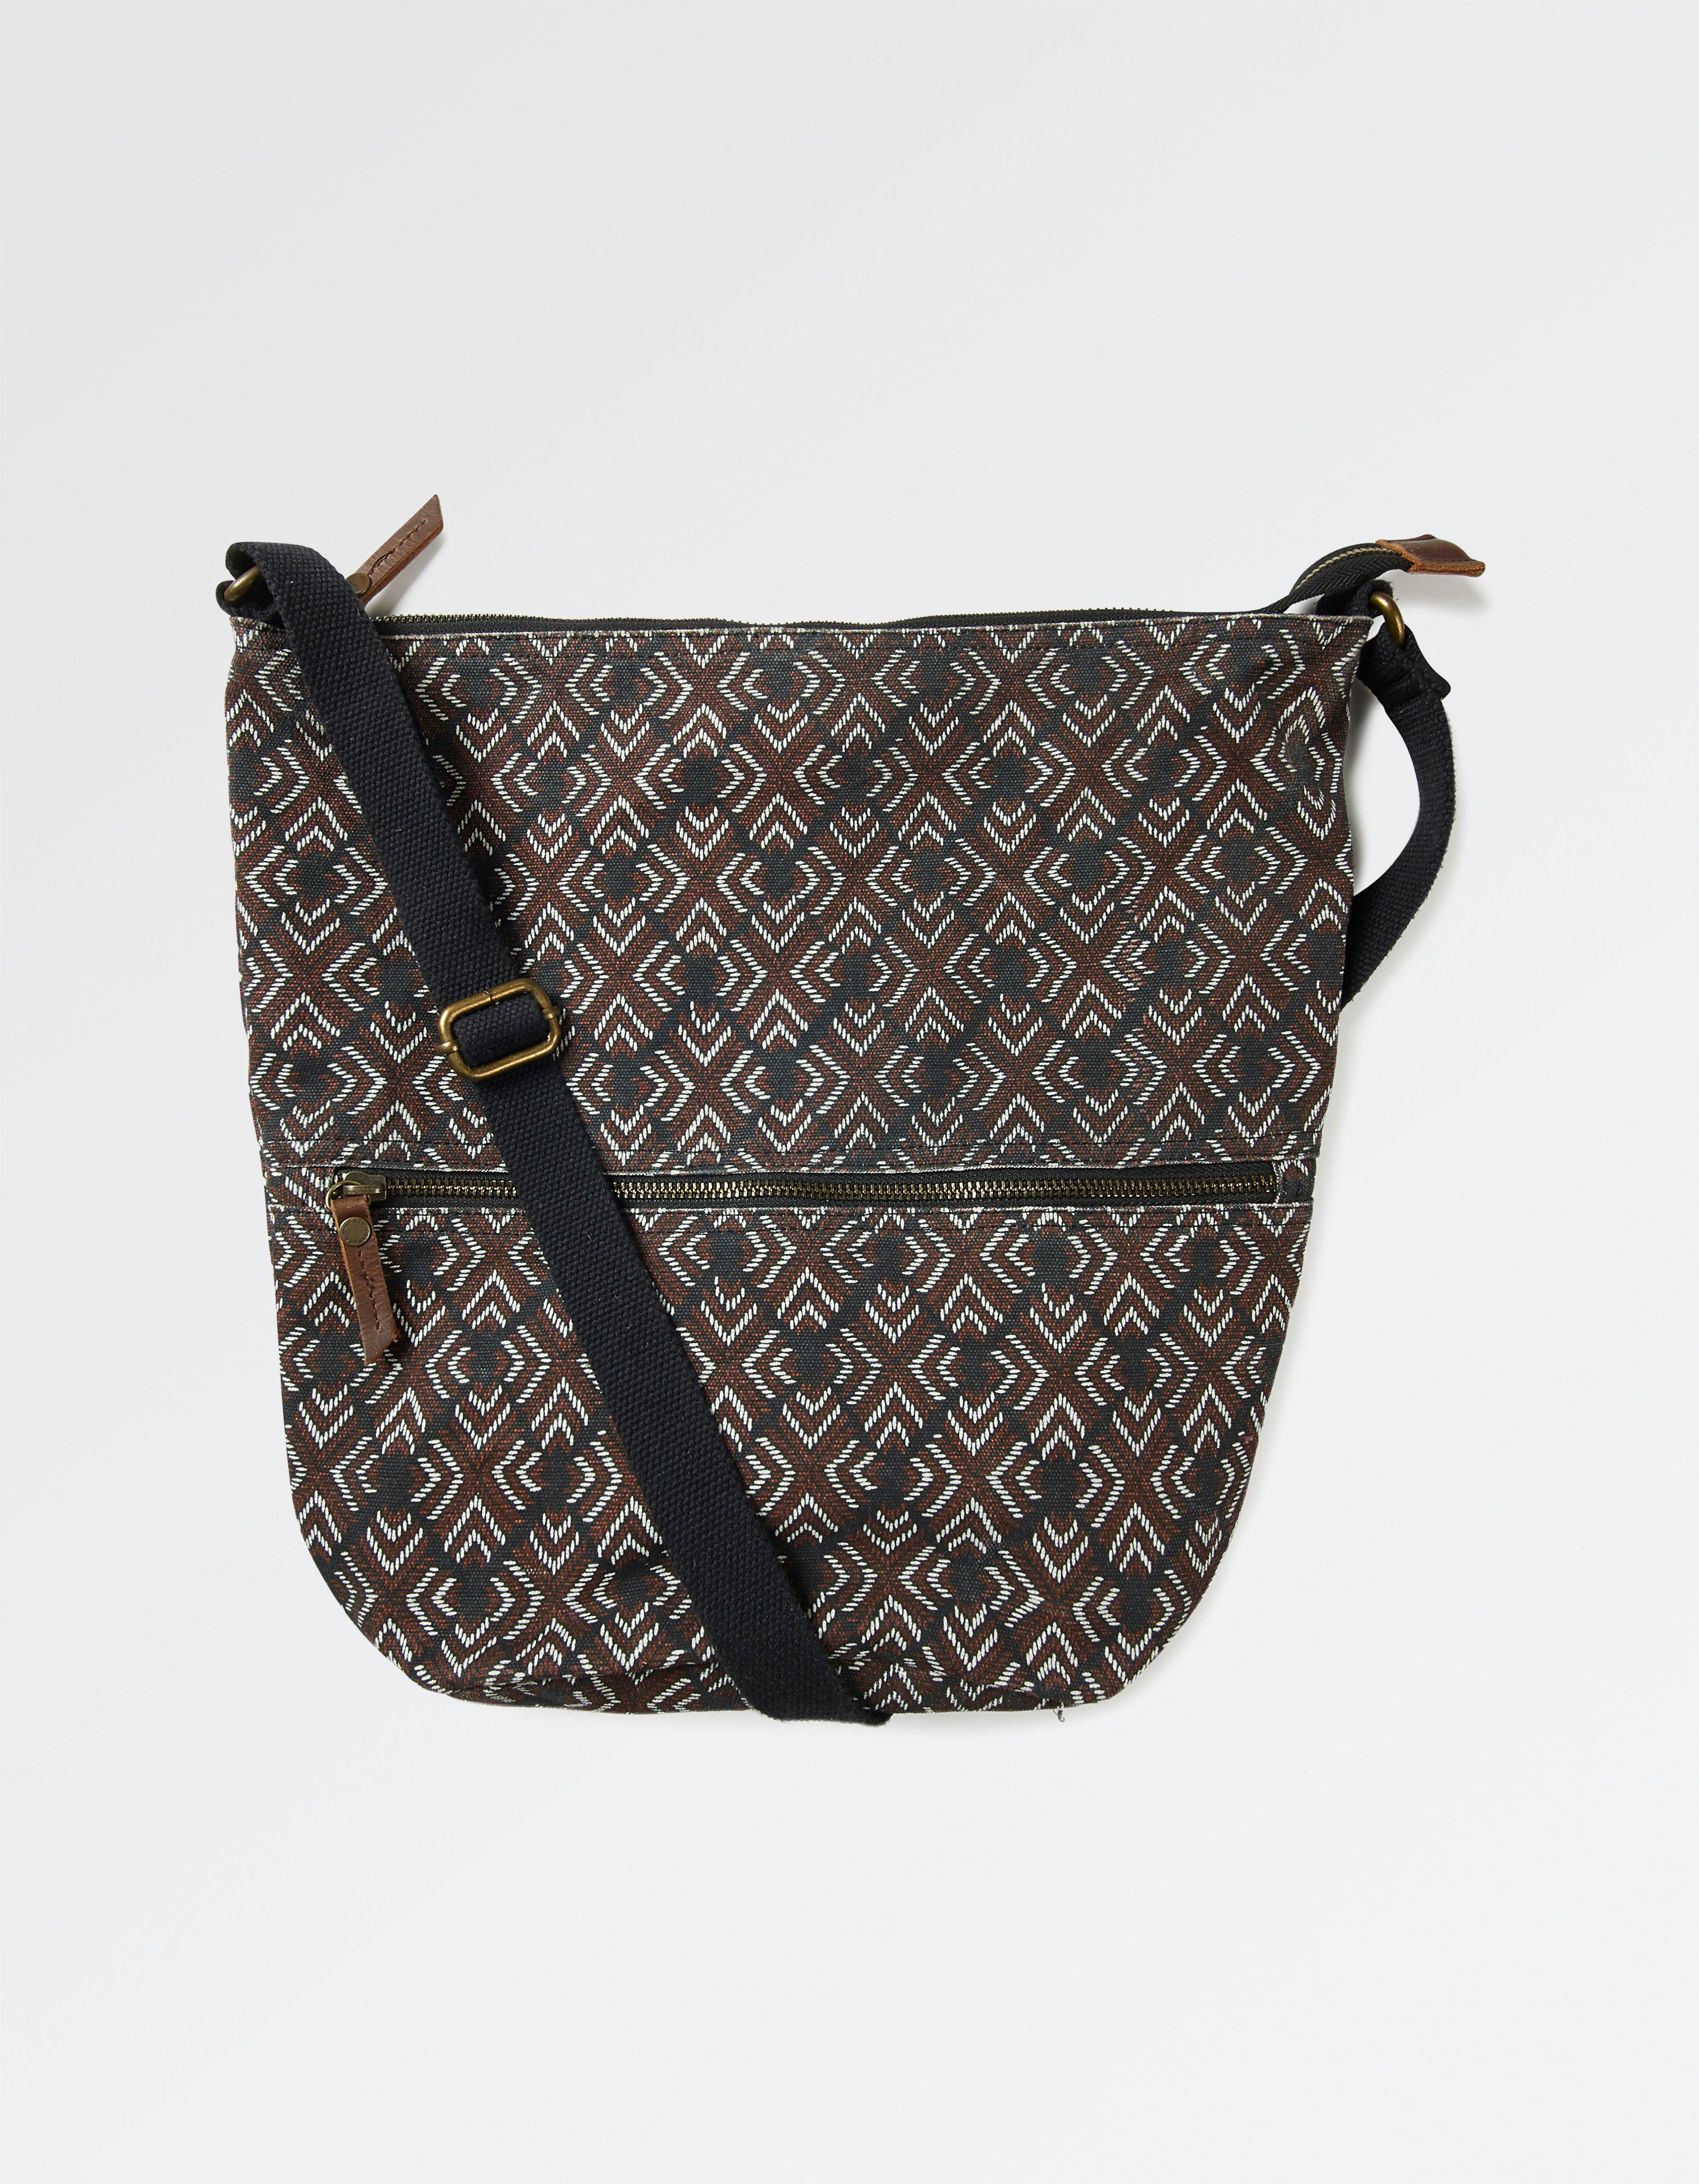 Diamond Stitch Tia Cross Body Bag